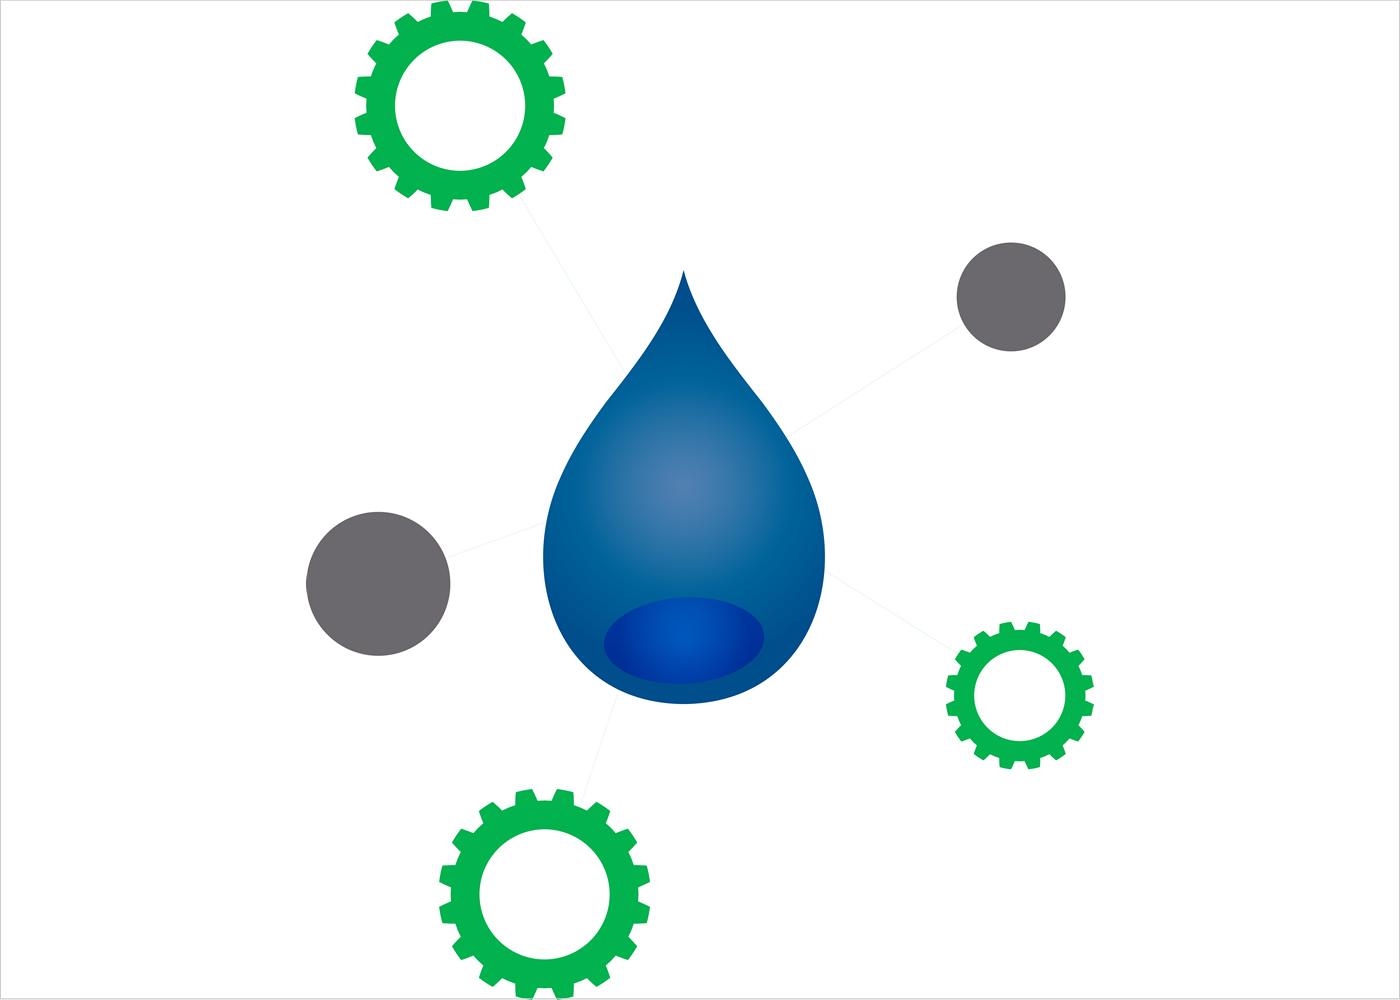 naem-webinar-2014-key-takeaways-from-naems-energy-water-nexus-report-700x500